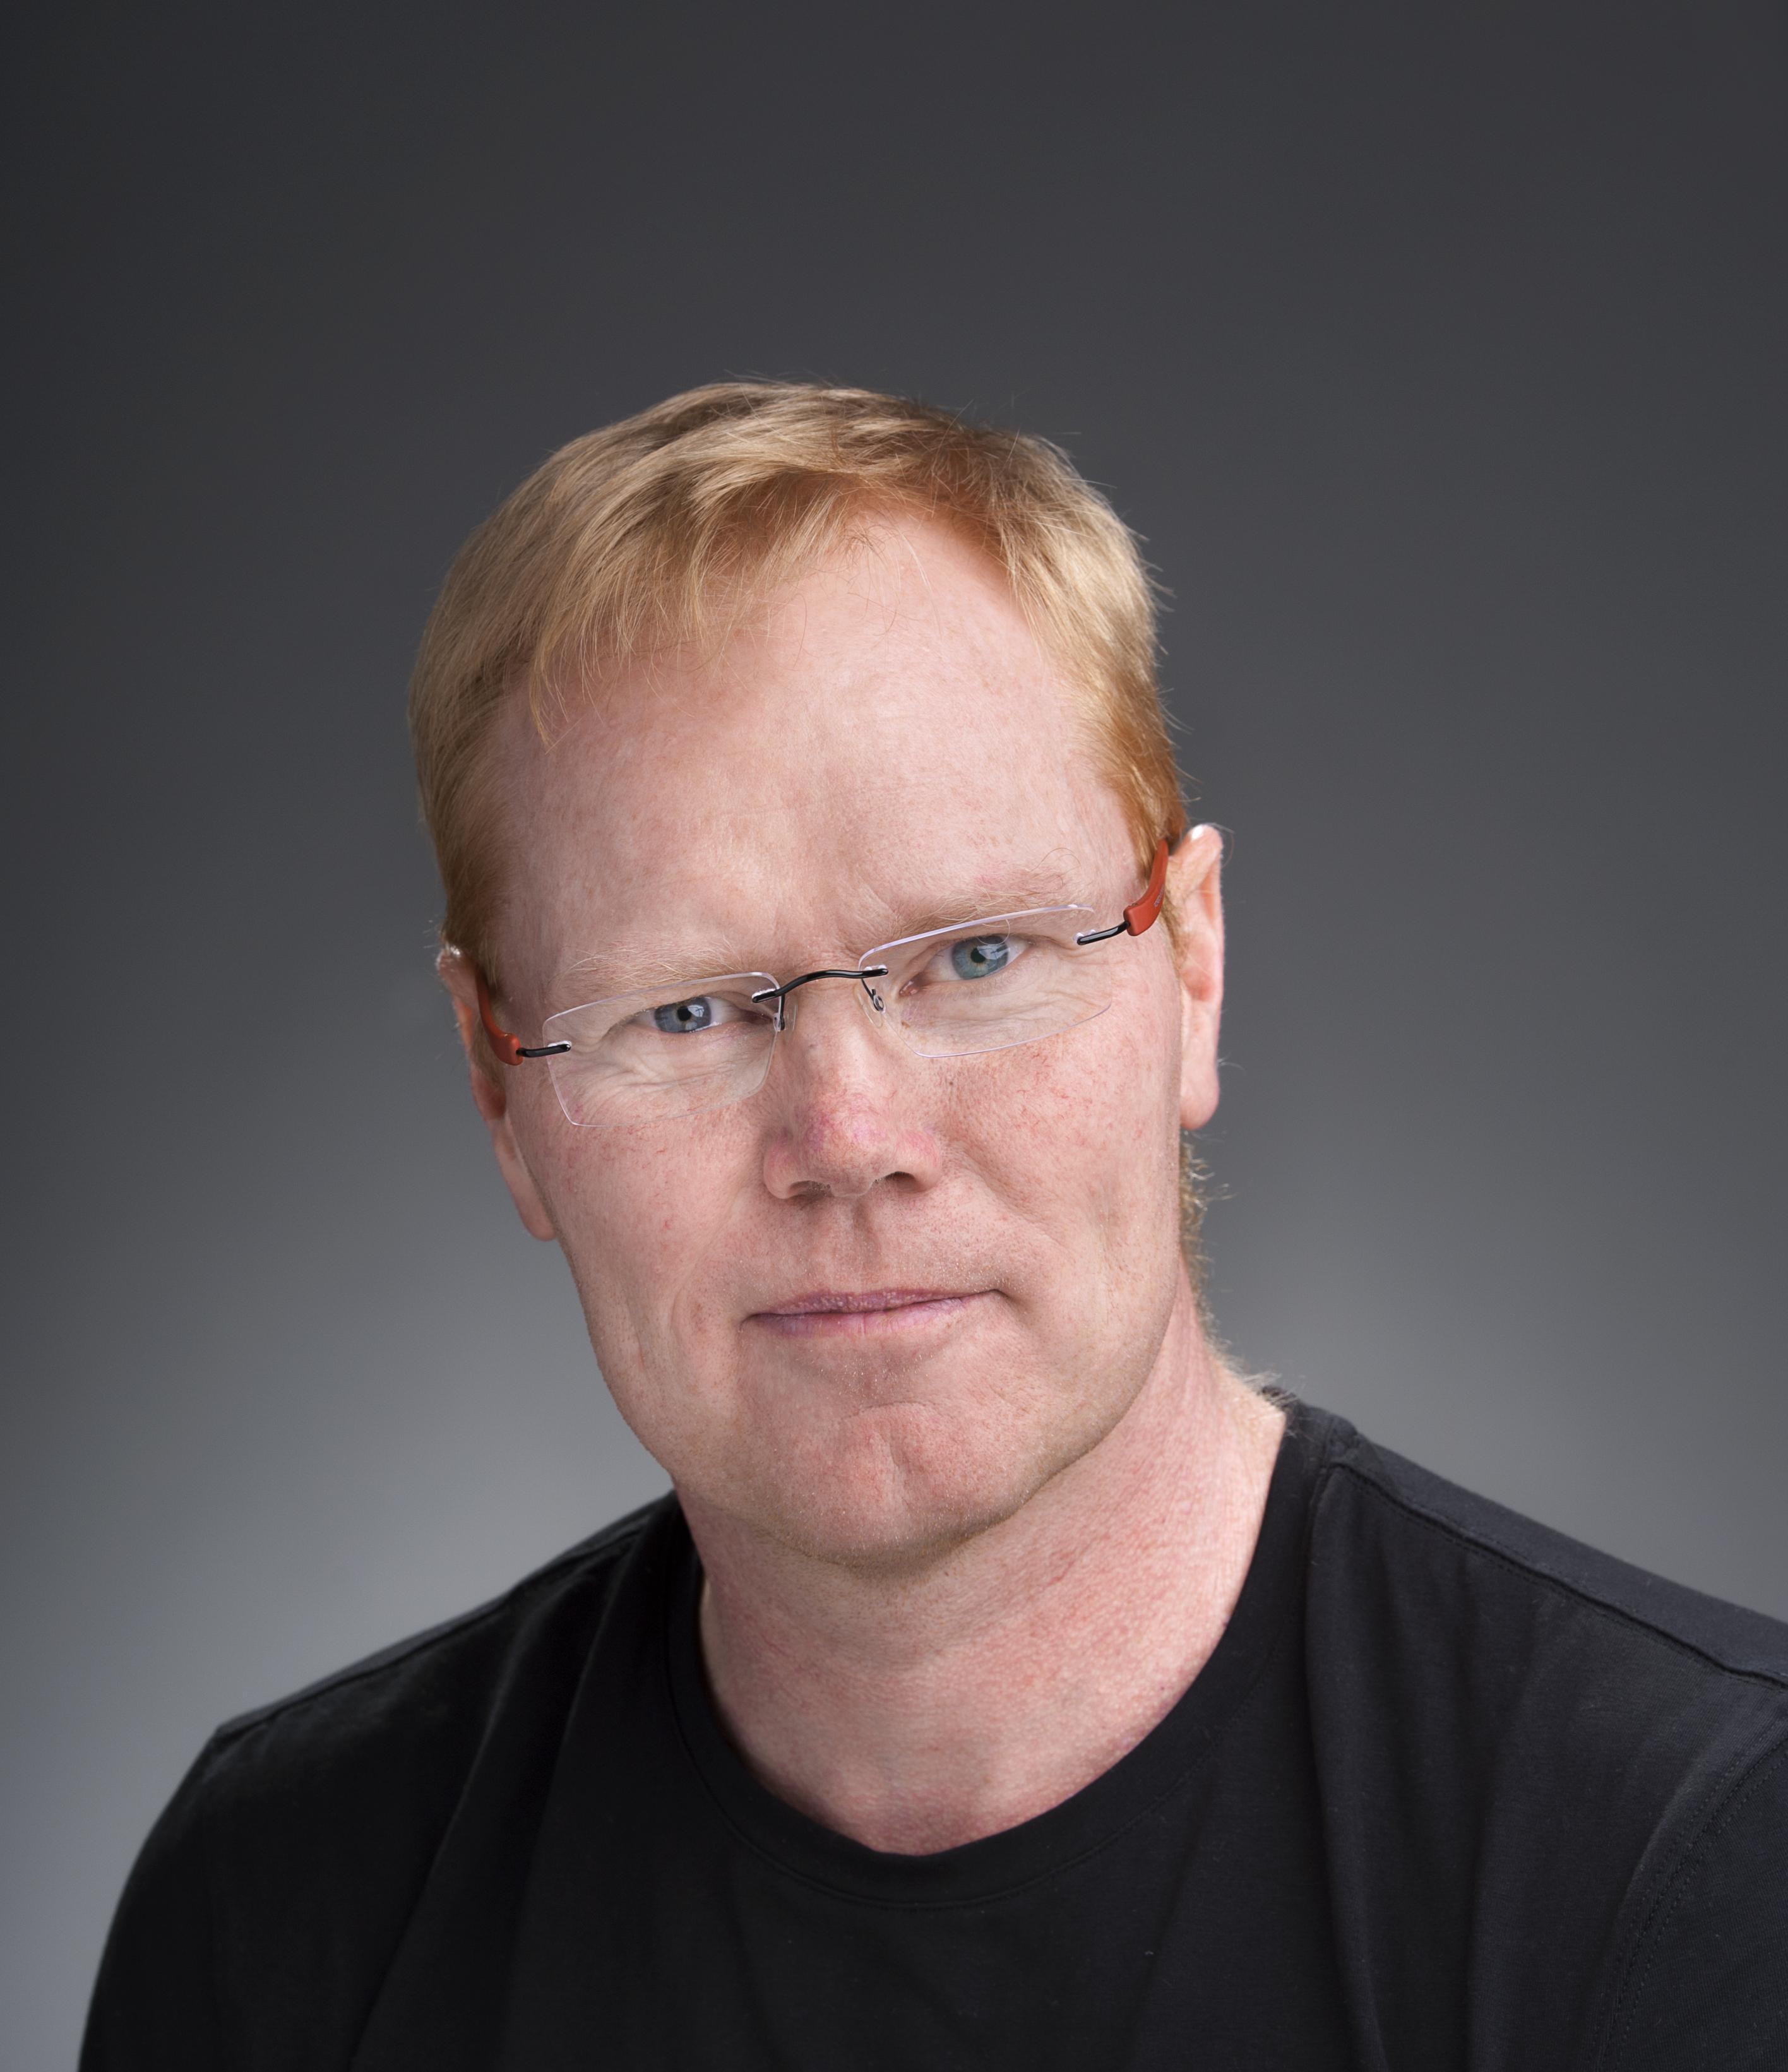 Dr. Peter Liljedahl